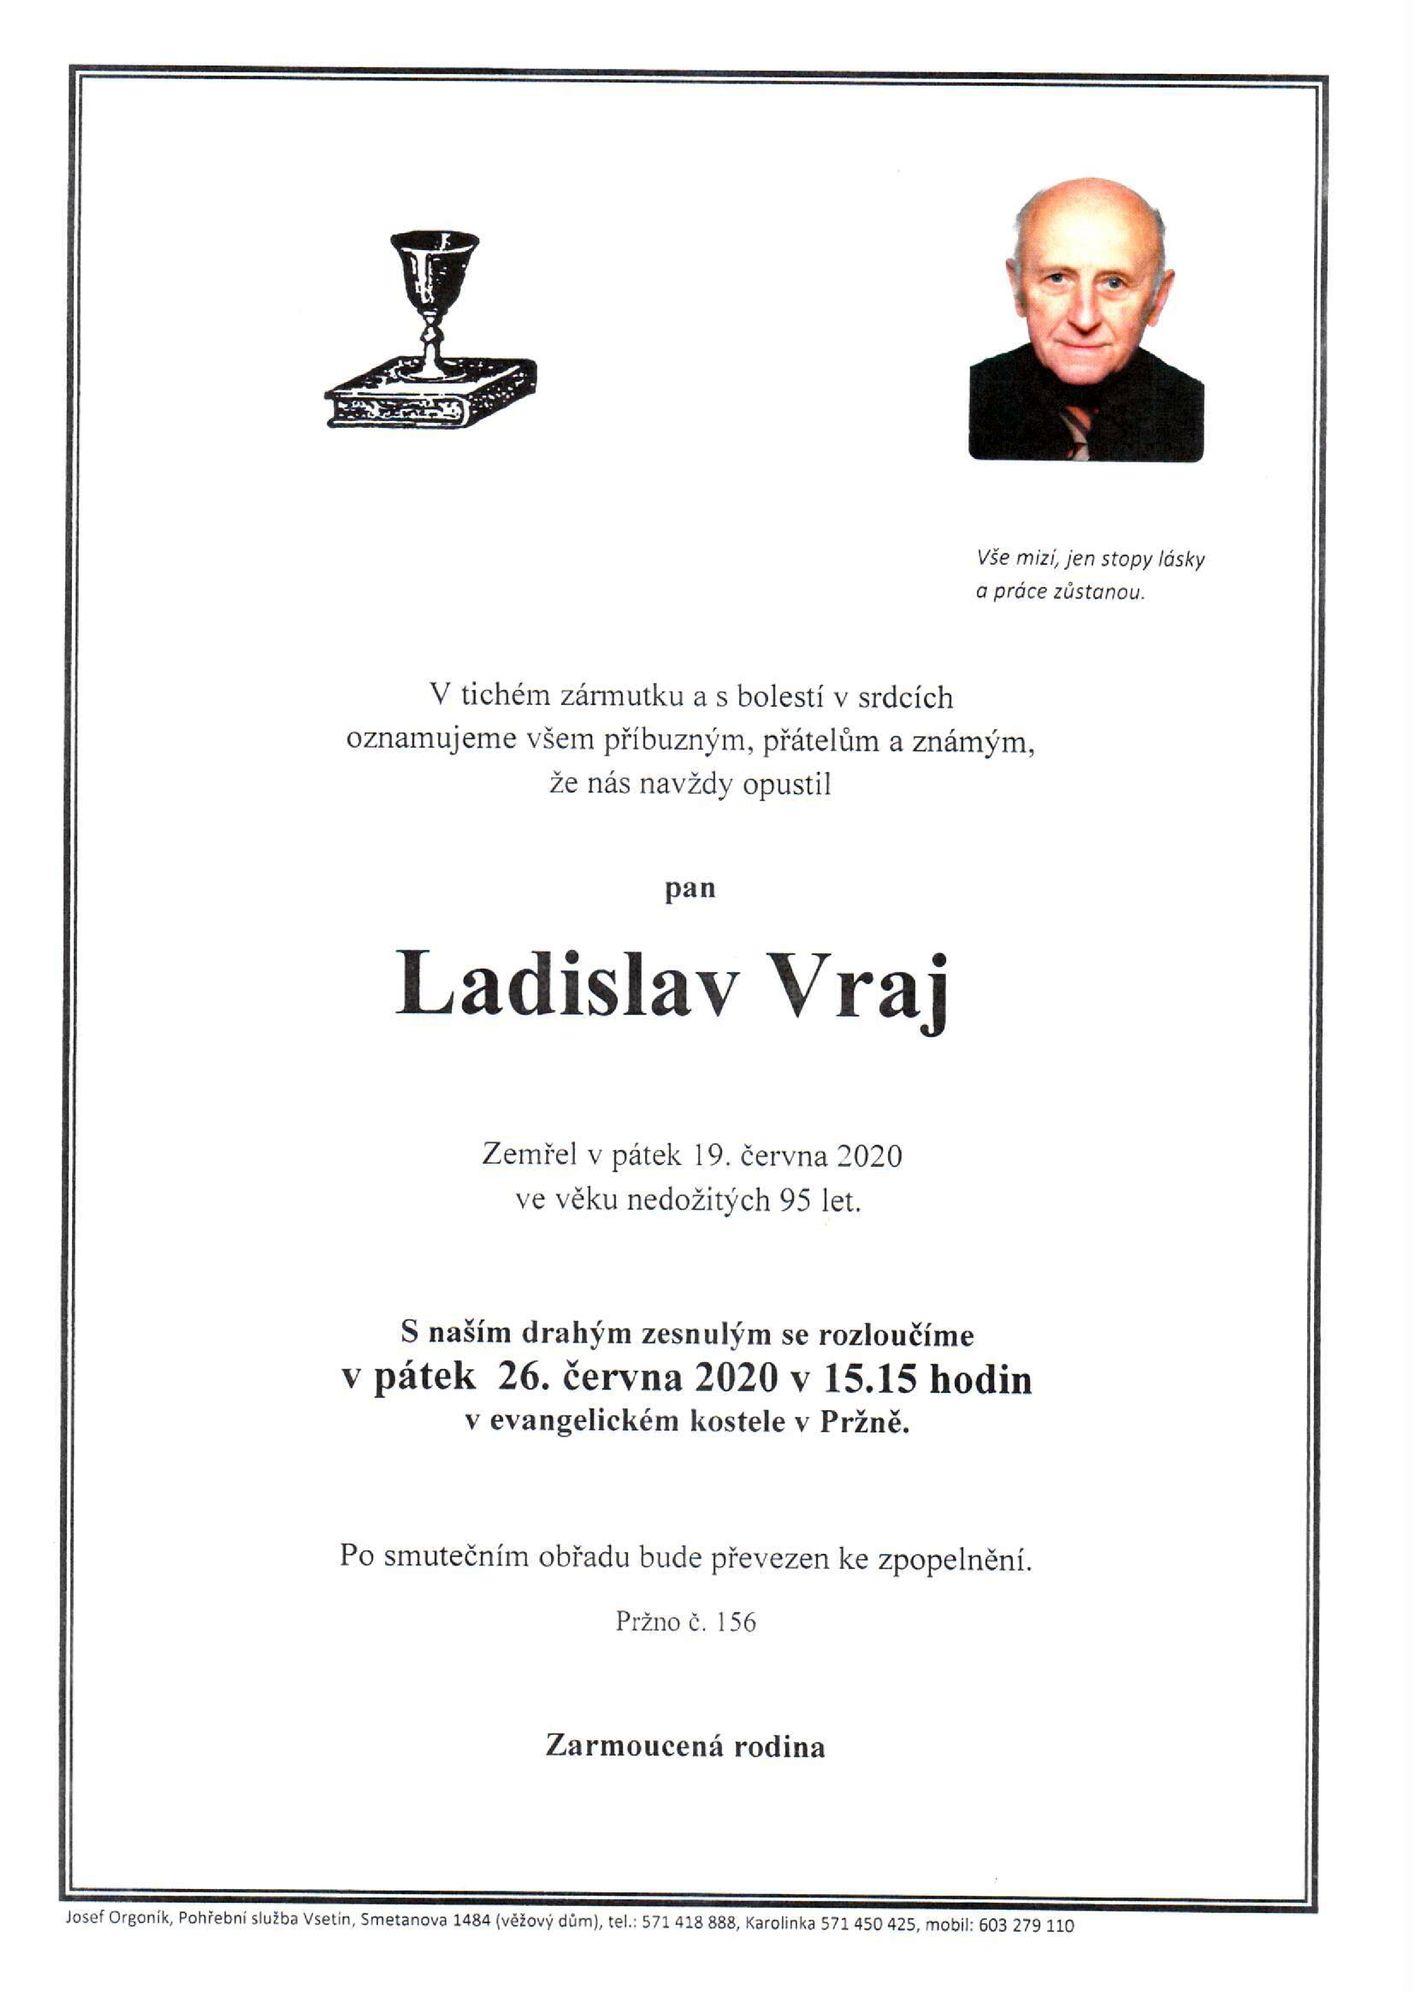 Ladislav Vraj